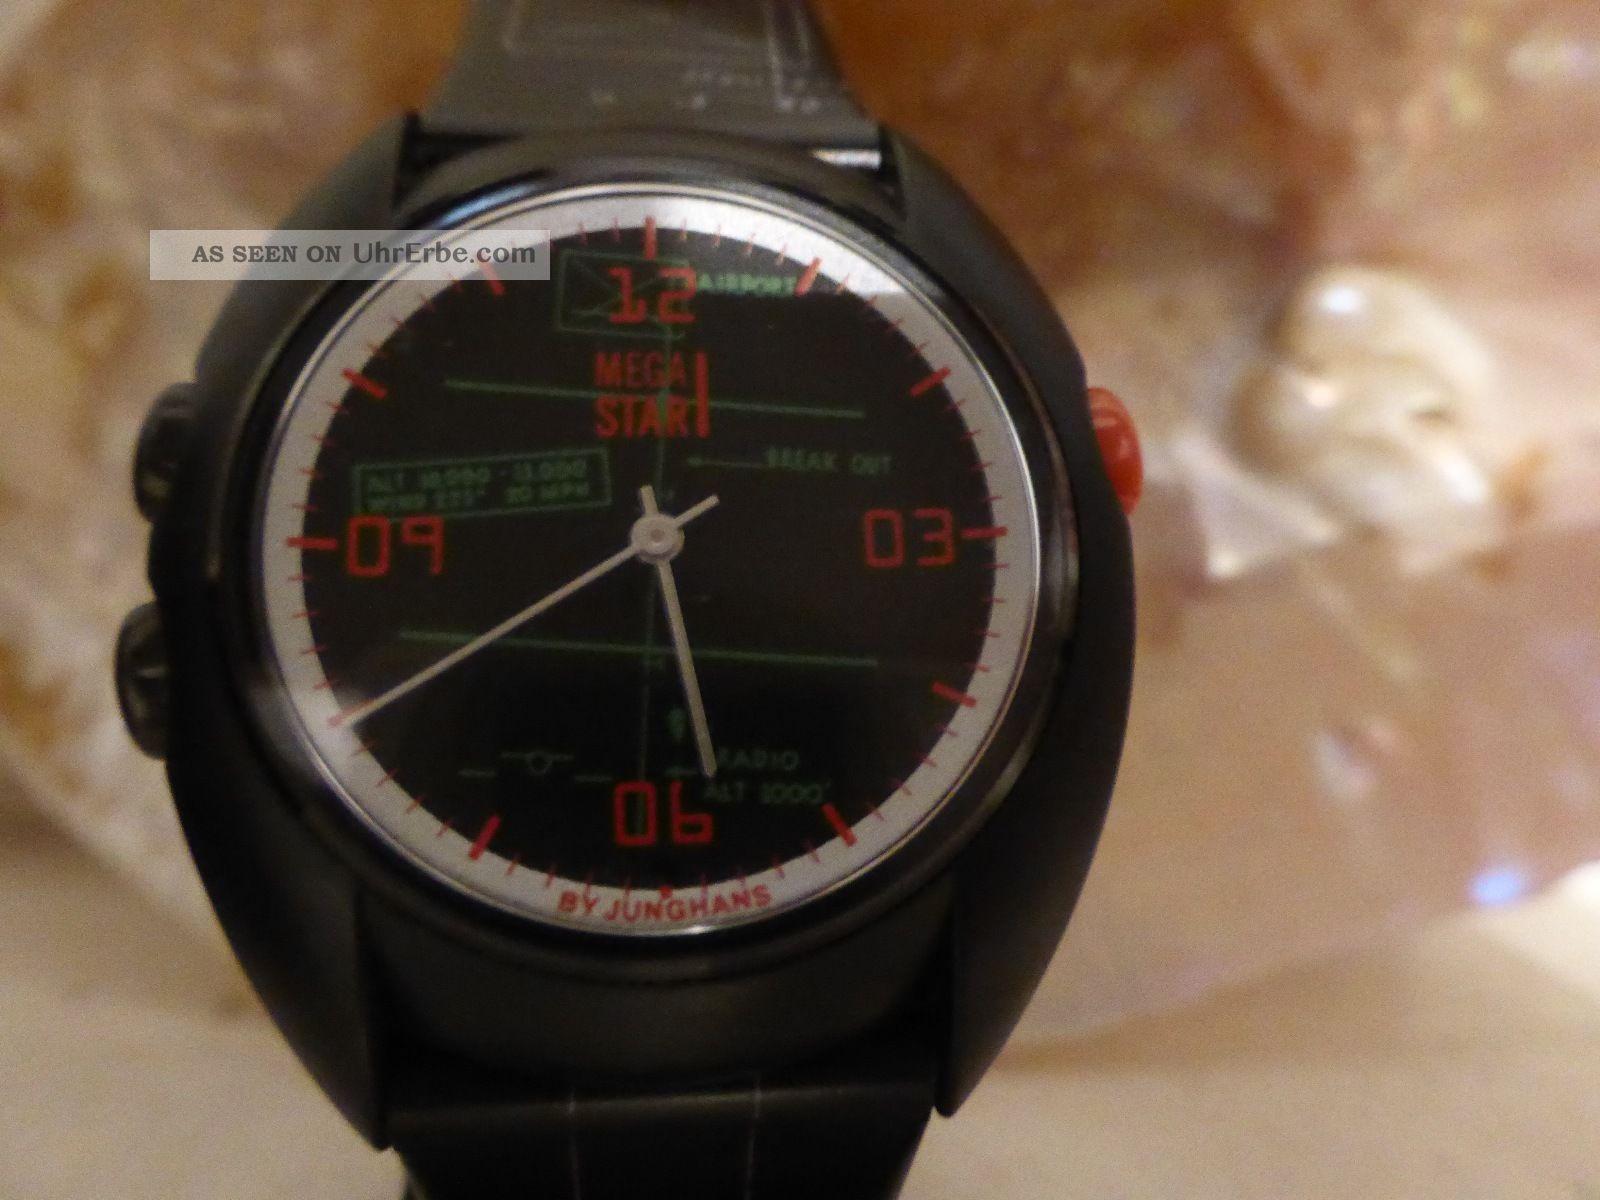 Junghans Mega Star Funkuhr - Ungetragen - Armbanduhren Bild